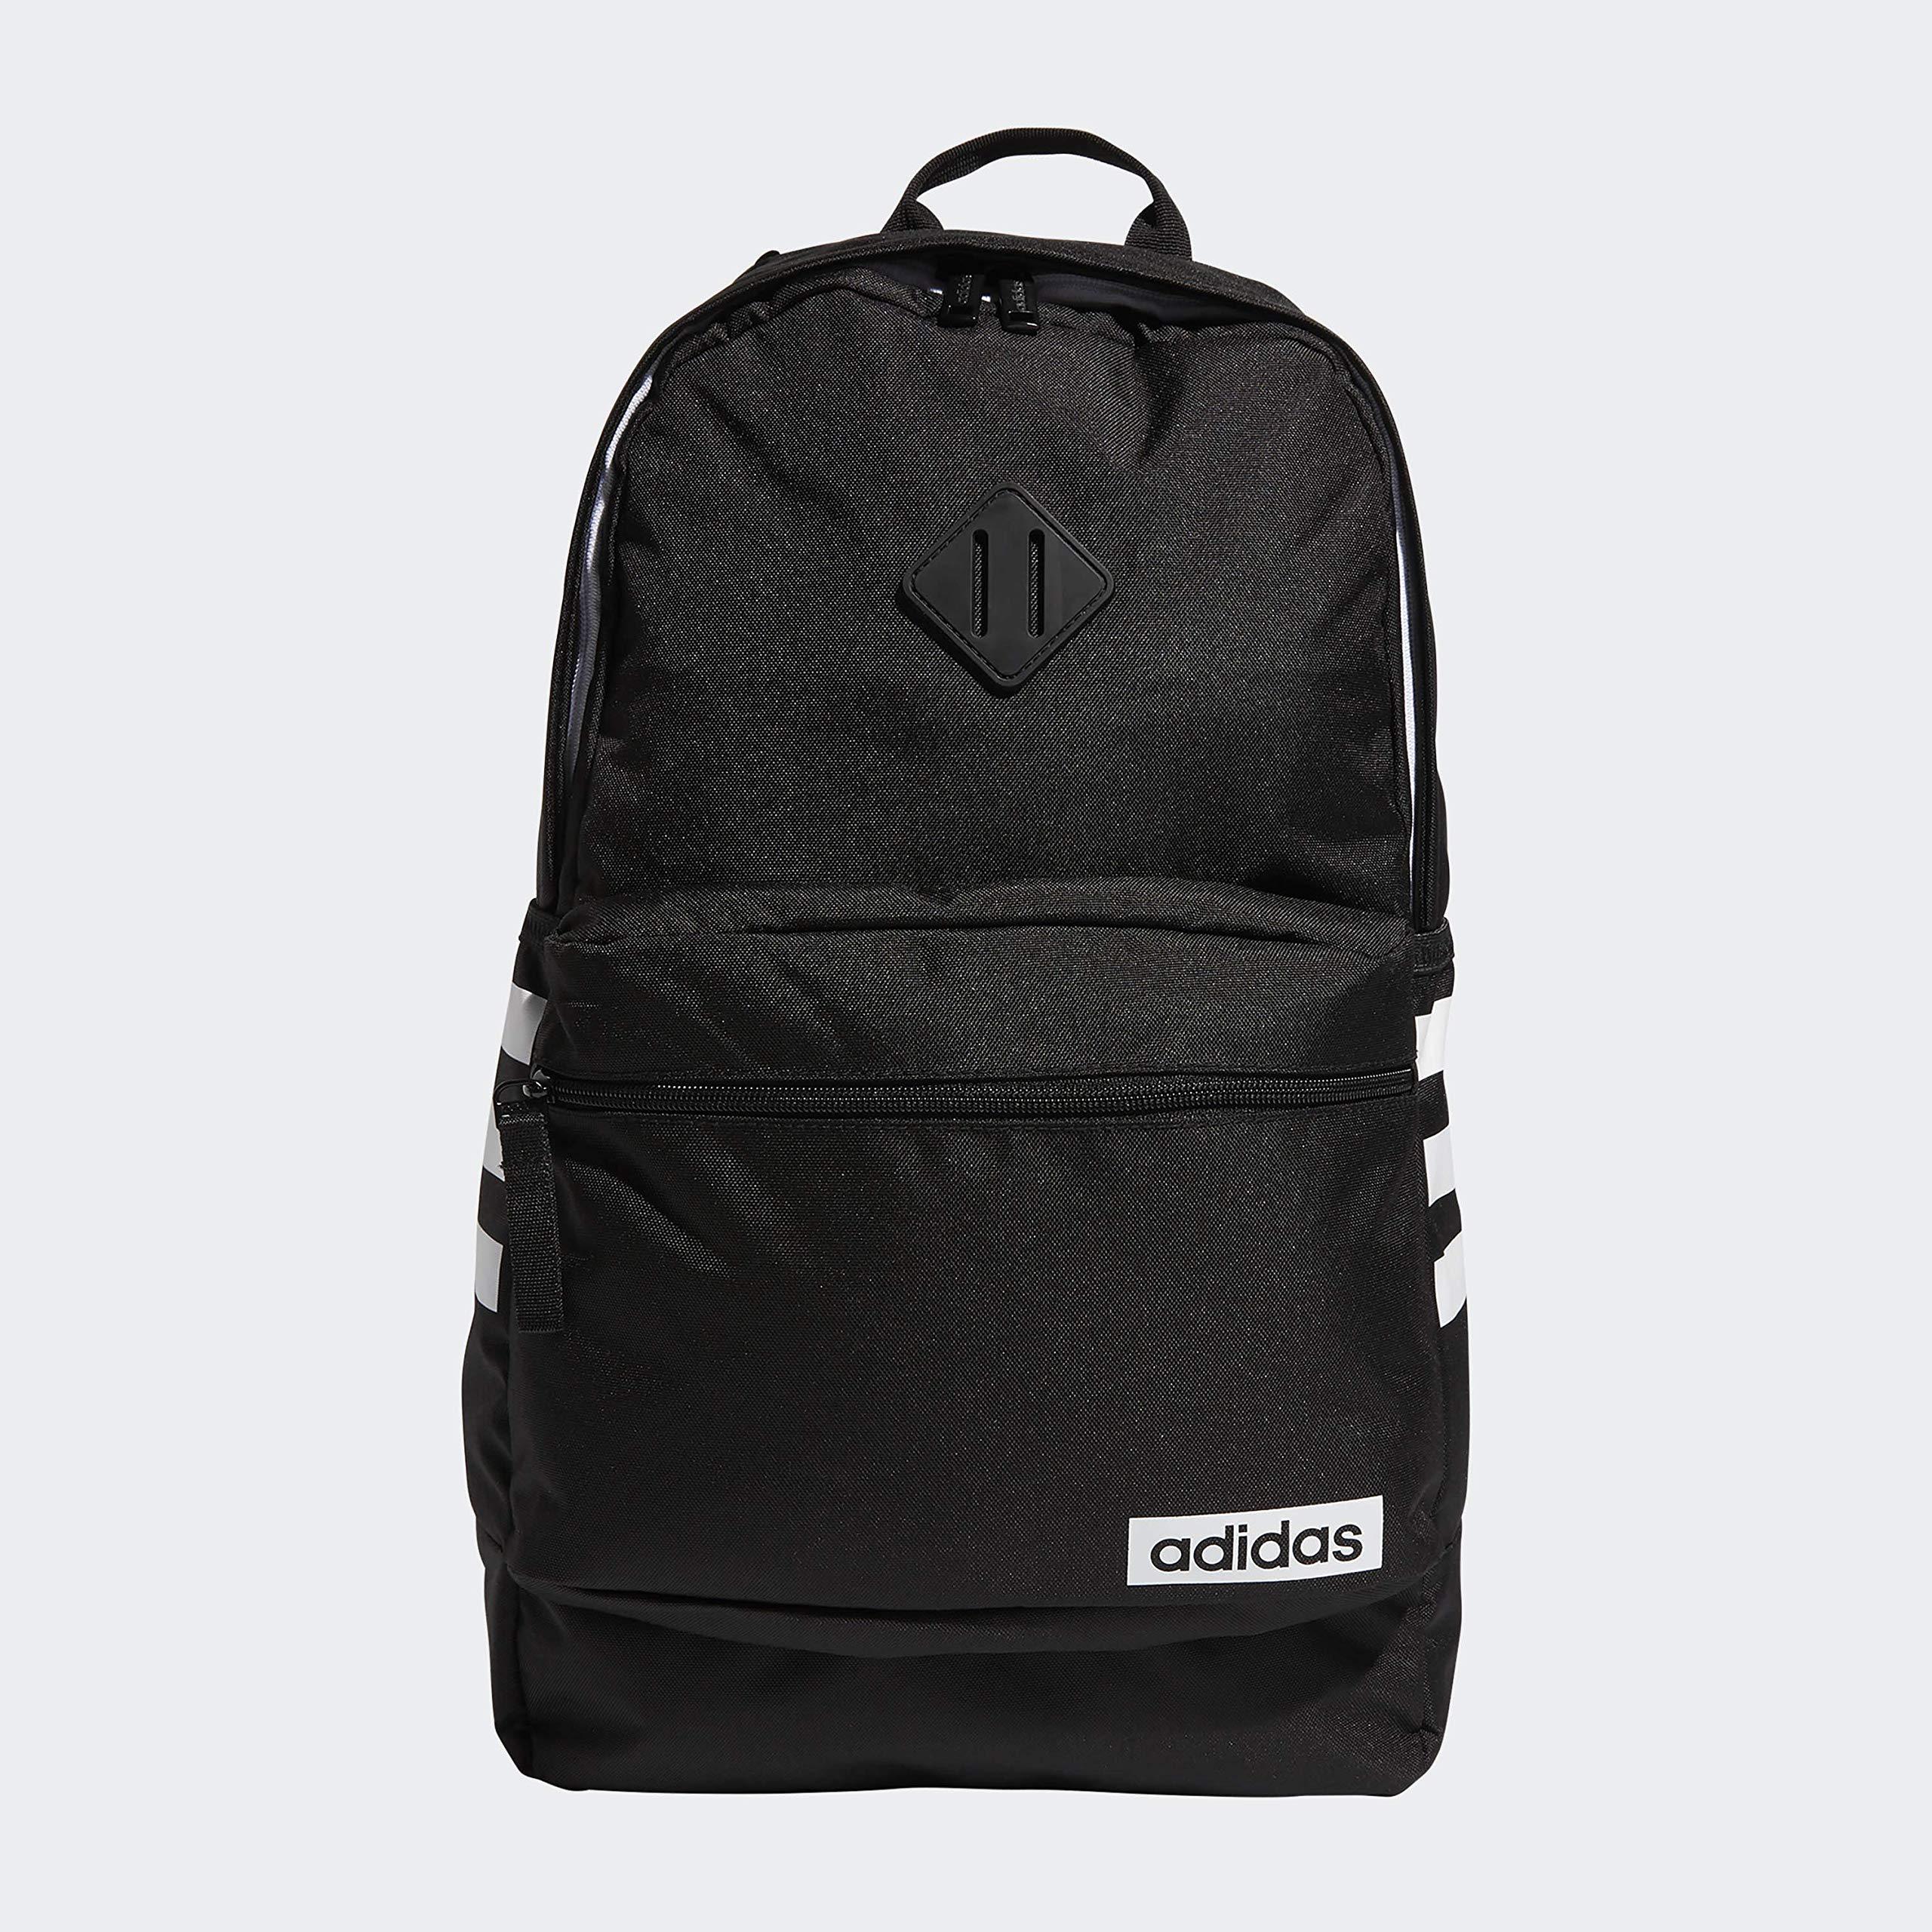 adidas Classic Backpack Black White